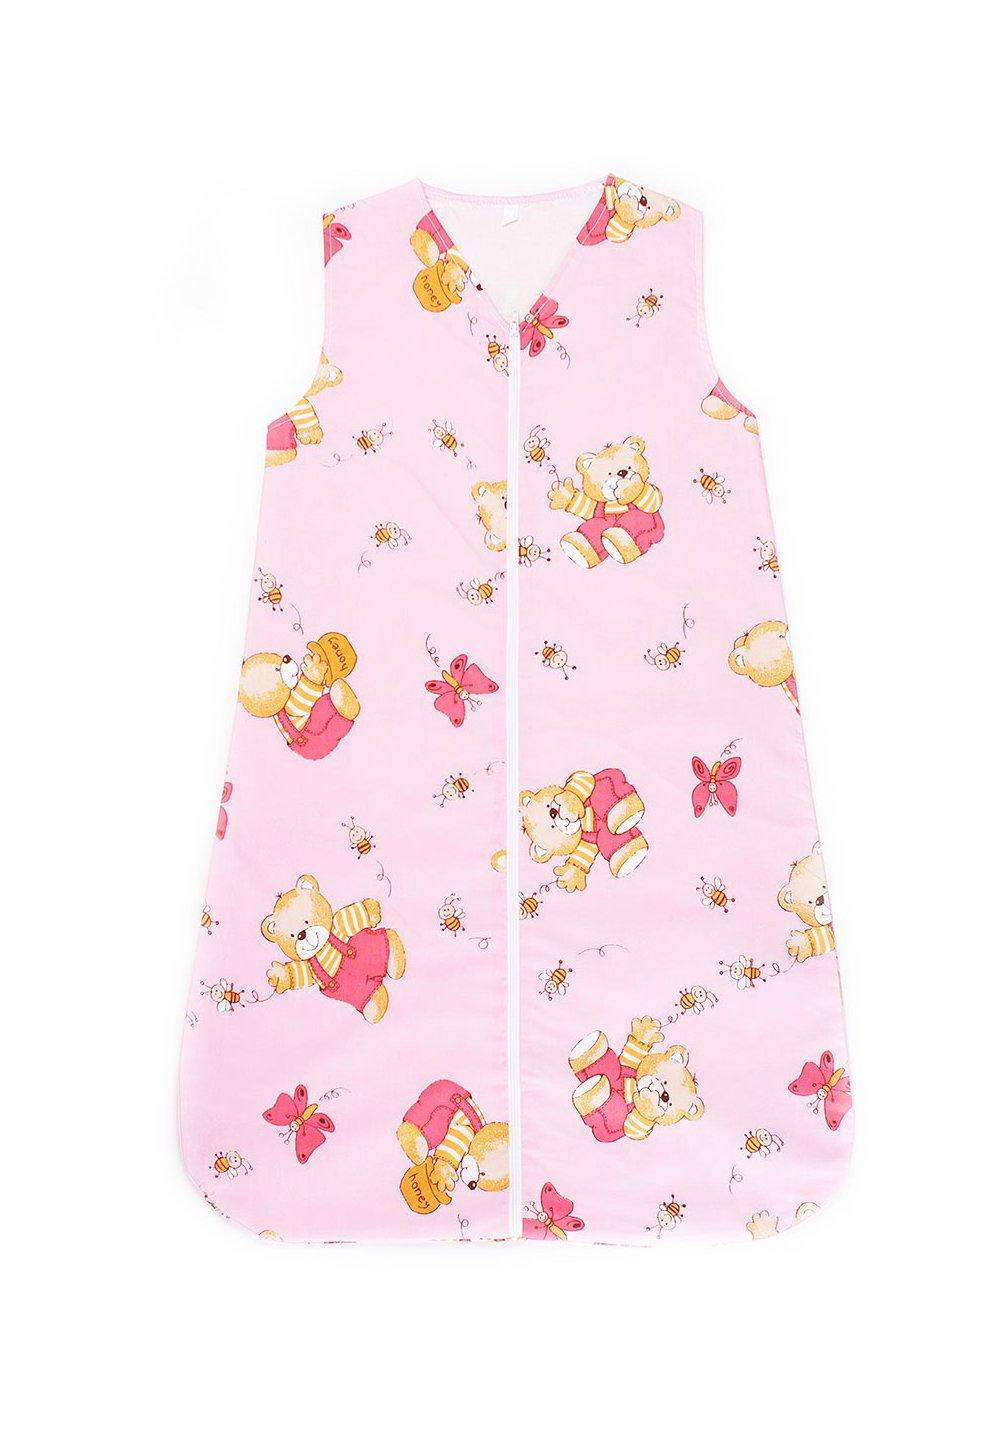 Sac de dormit, iarna, ursulet cu albinute, roz imagine